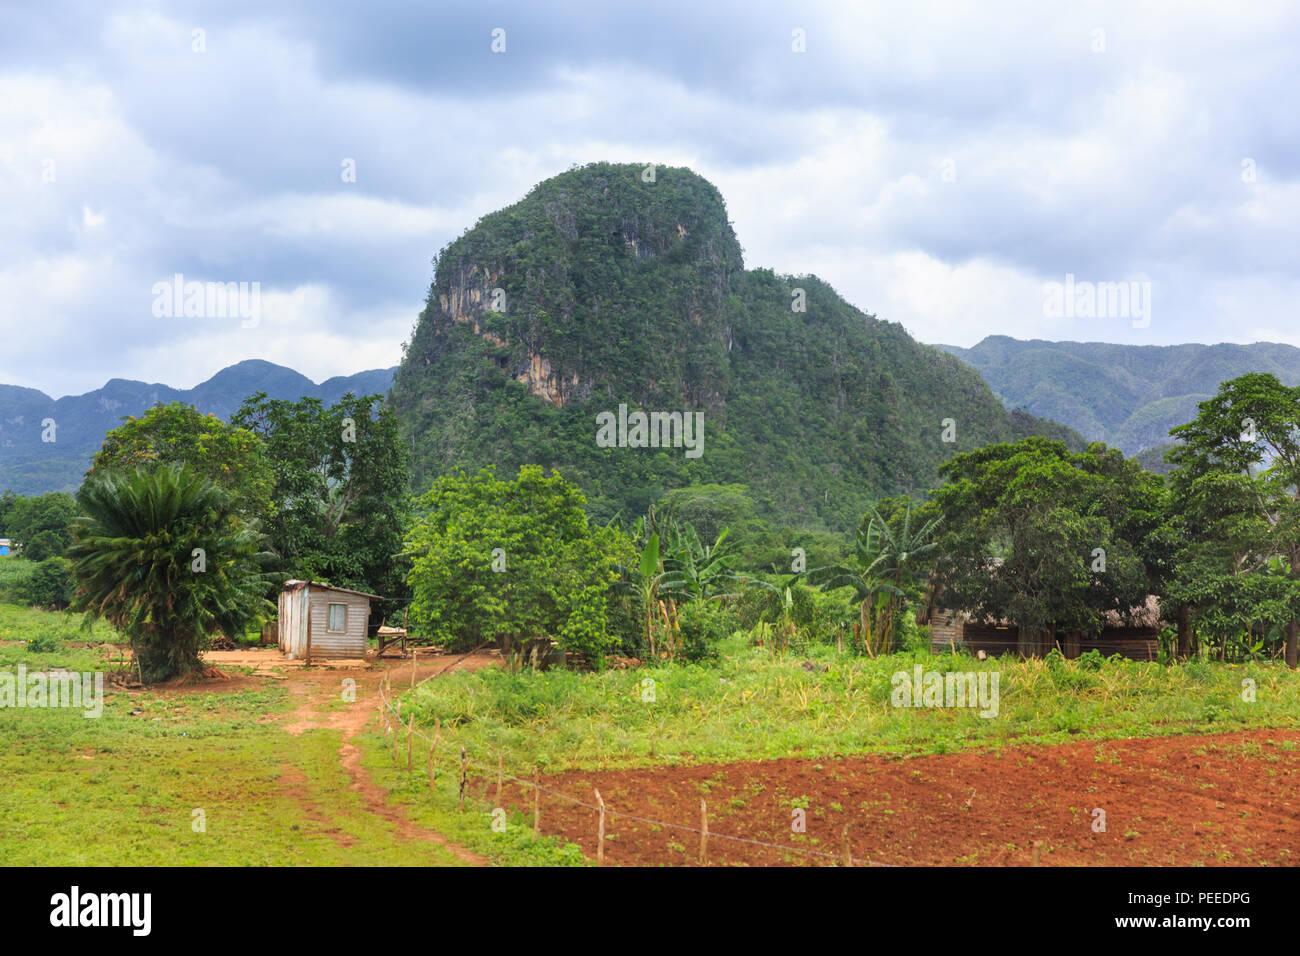 Viñales Valley panorama, view across lush green landscape of the popular rural tourist travel destination, Pinar del Rio Province, Cuba Stock Photo